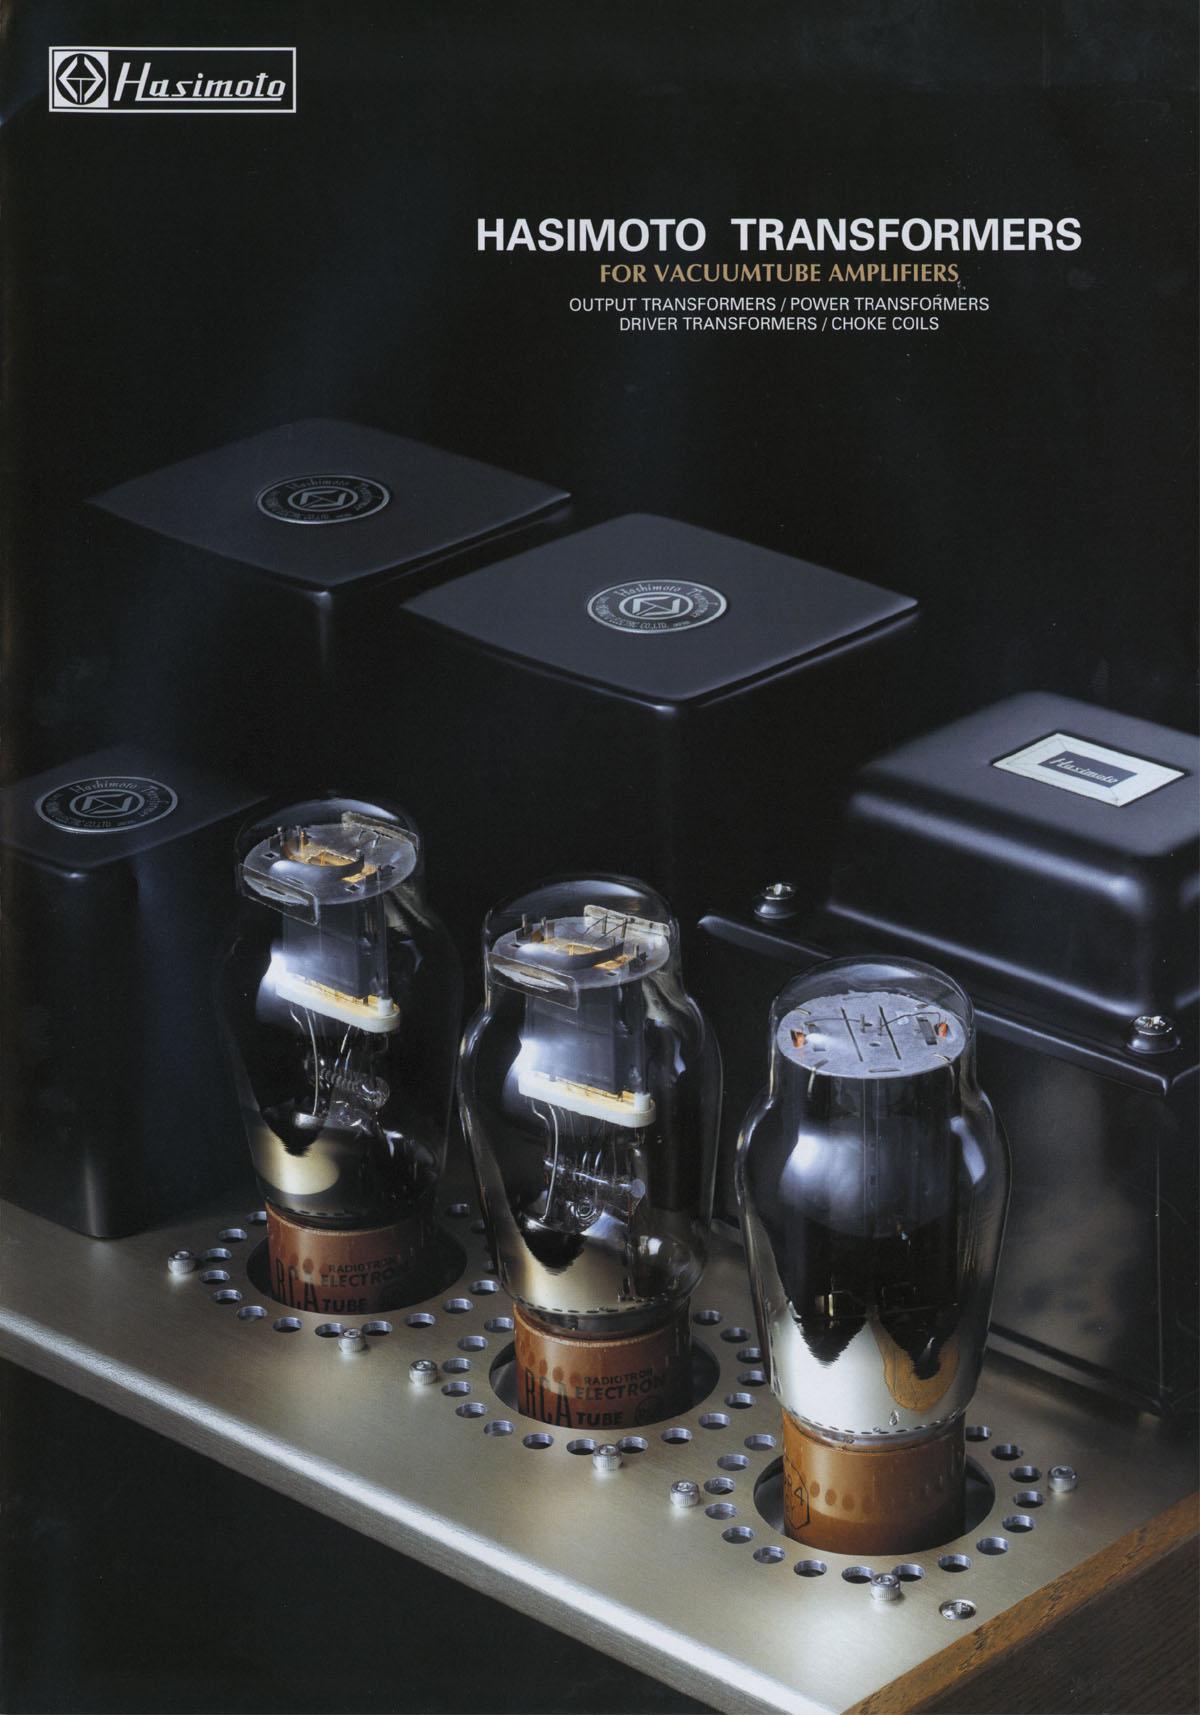 Hashimoto Sansui Vacuum tube transformer vacuum tube